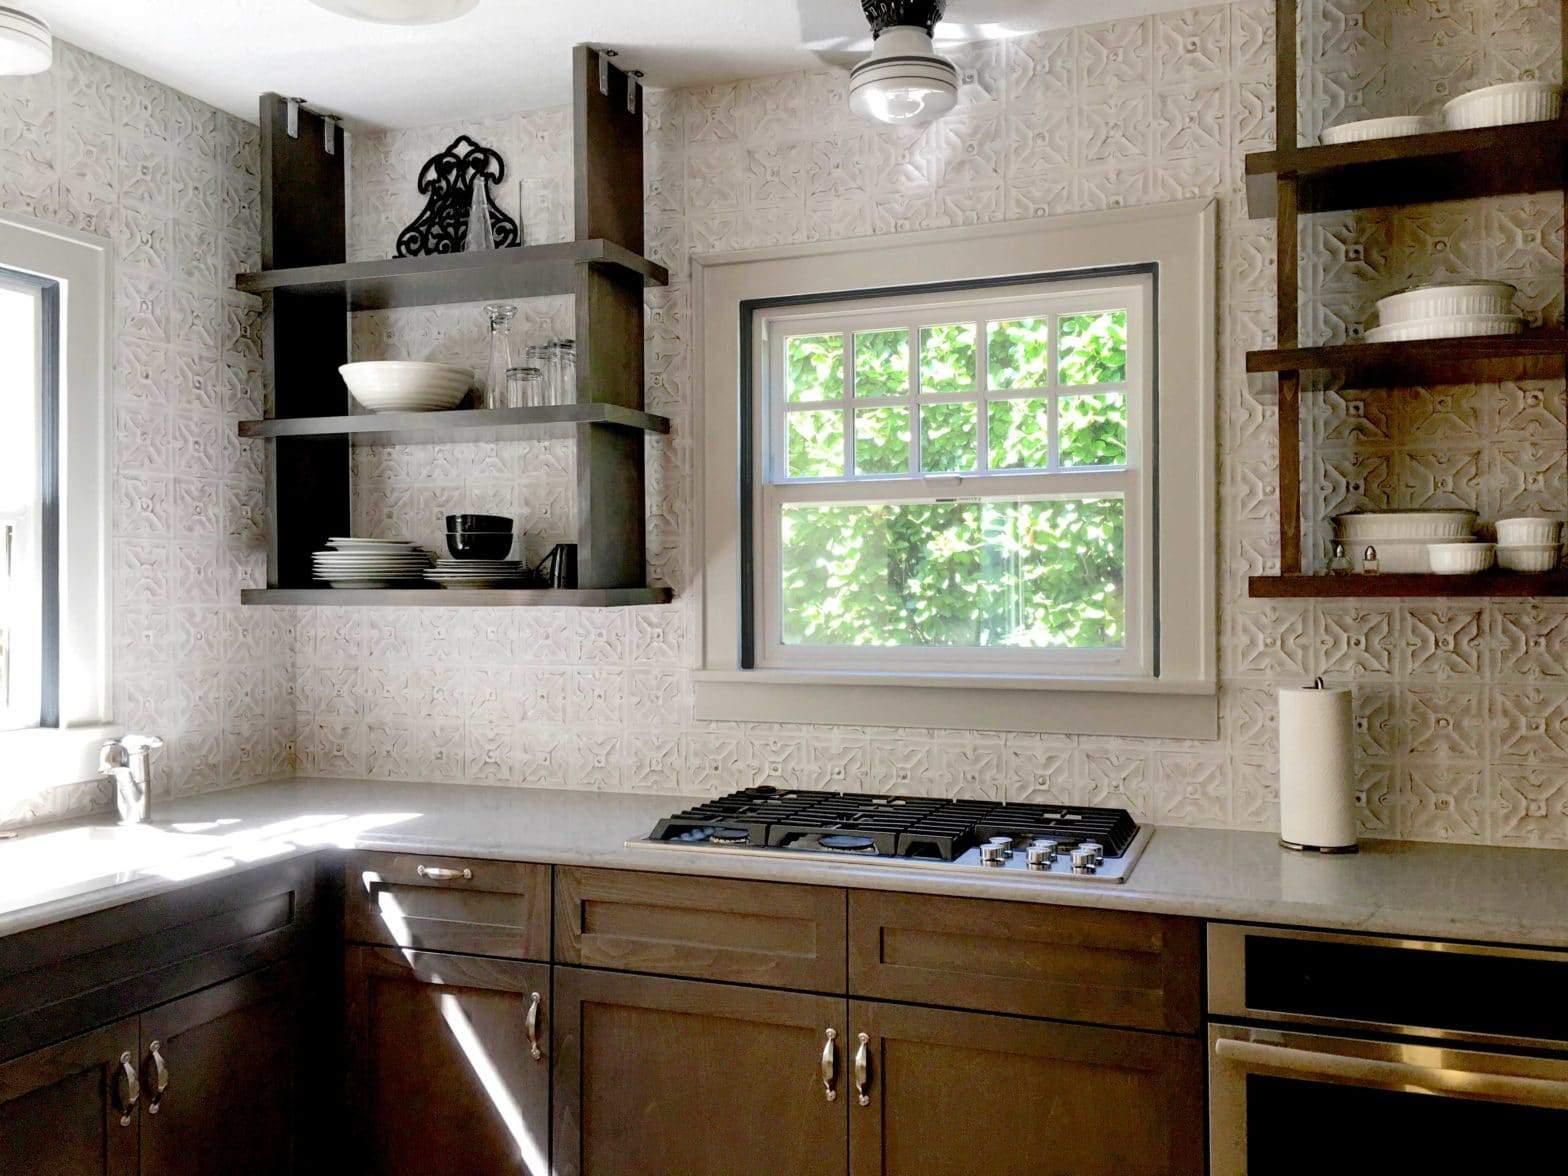 Beautiful Tile In Portland Kitchen Remodel